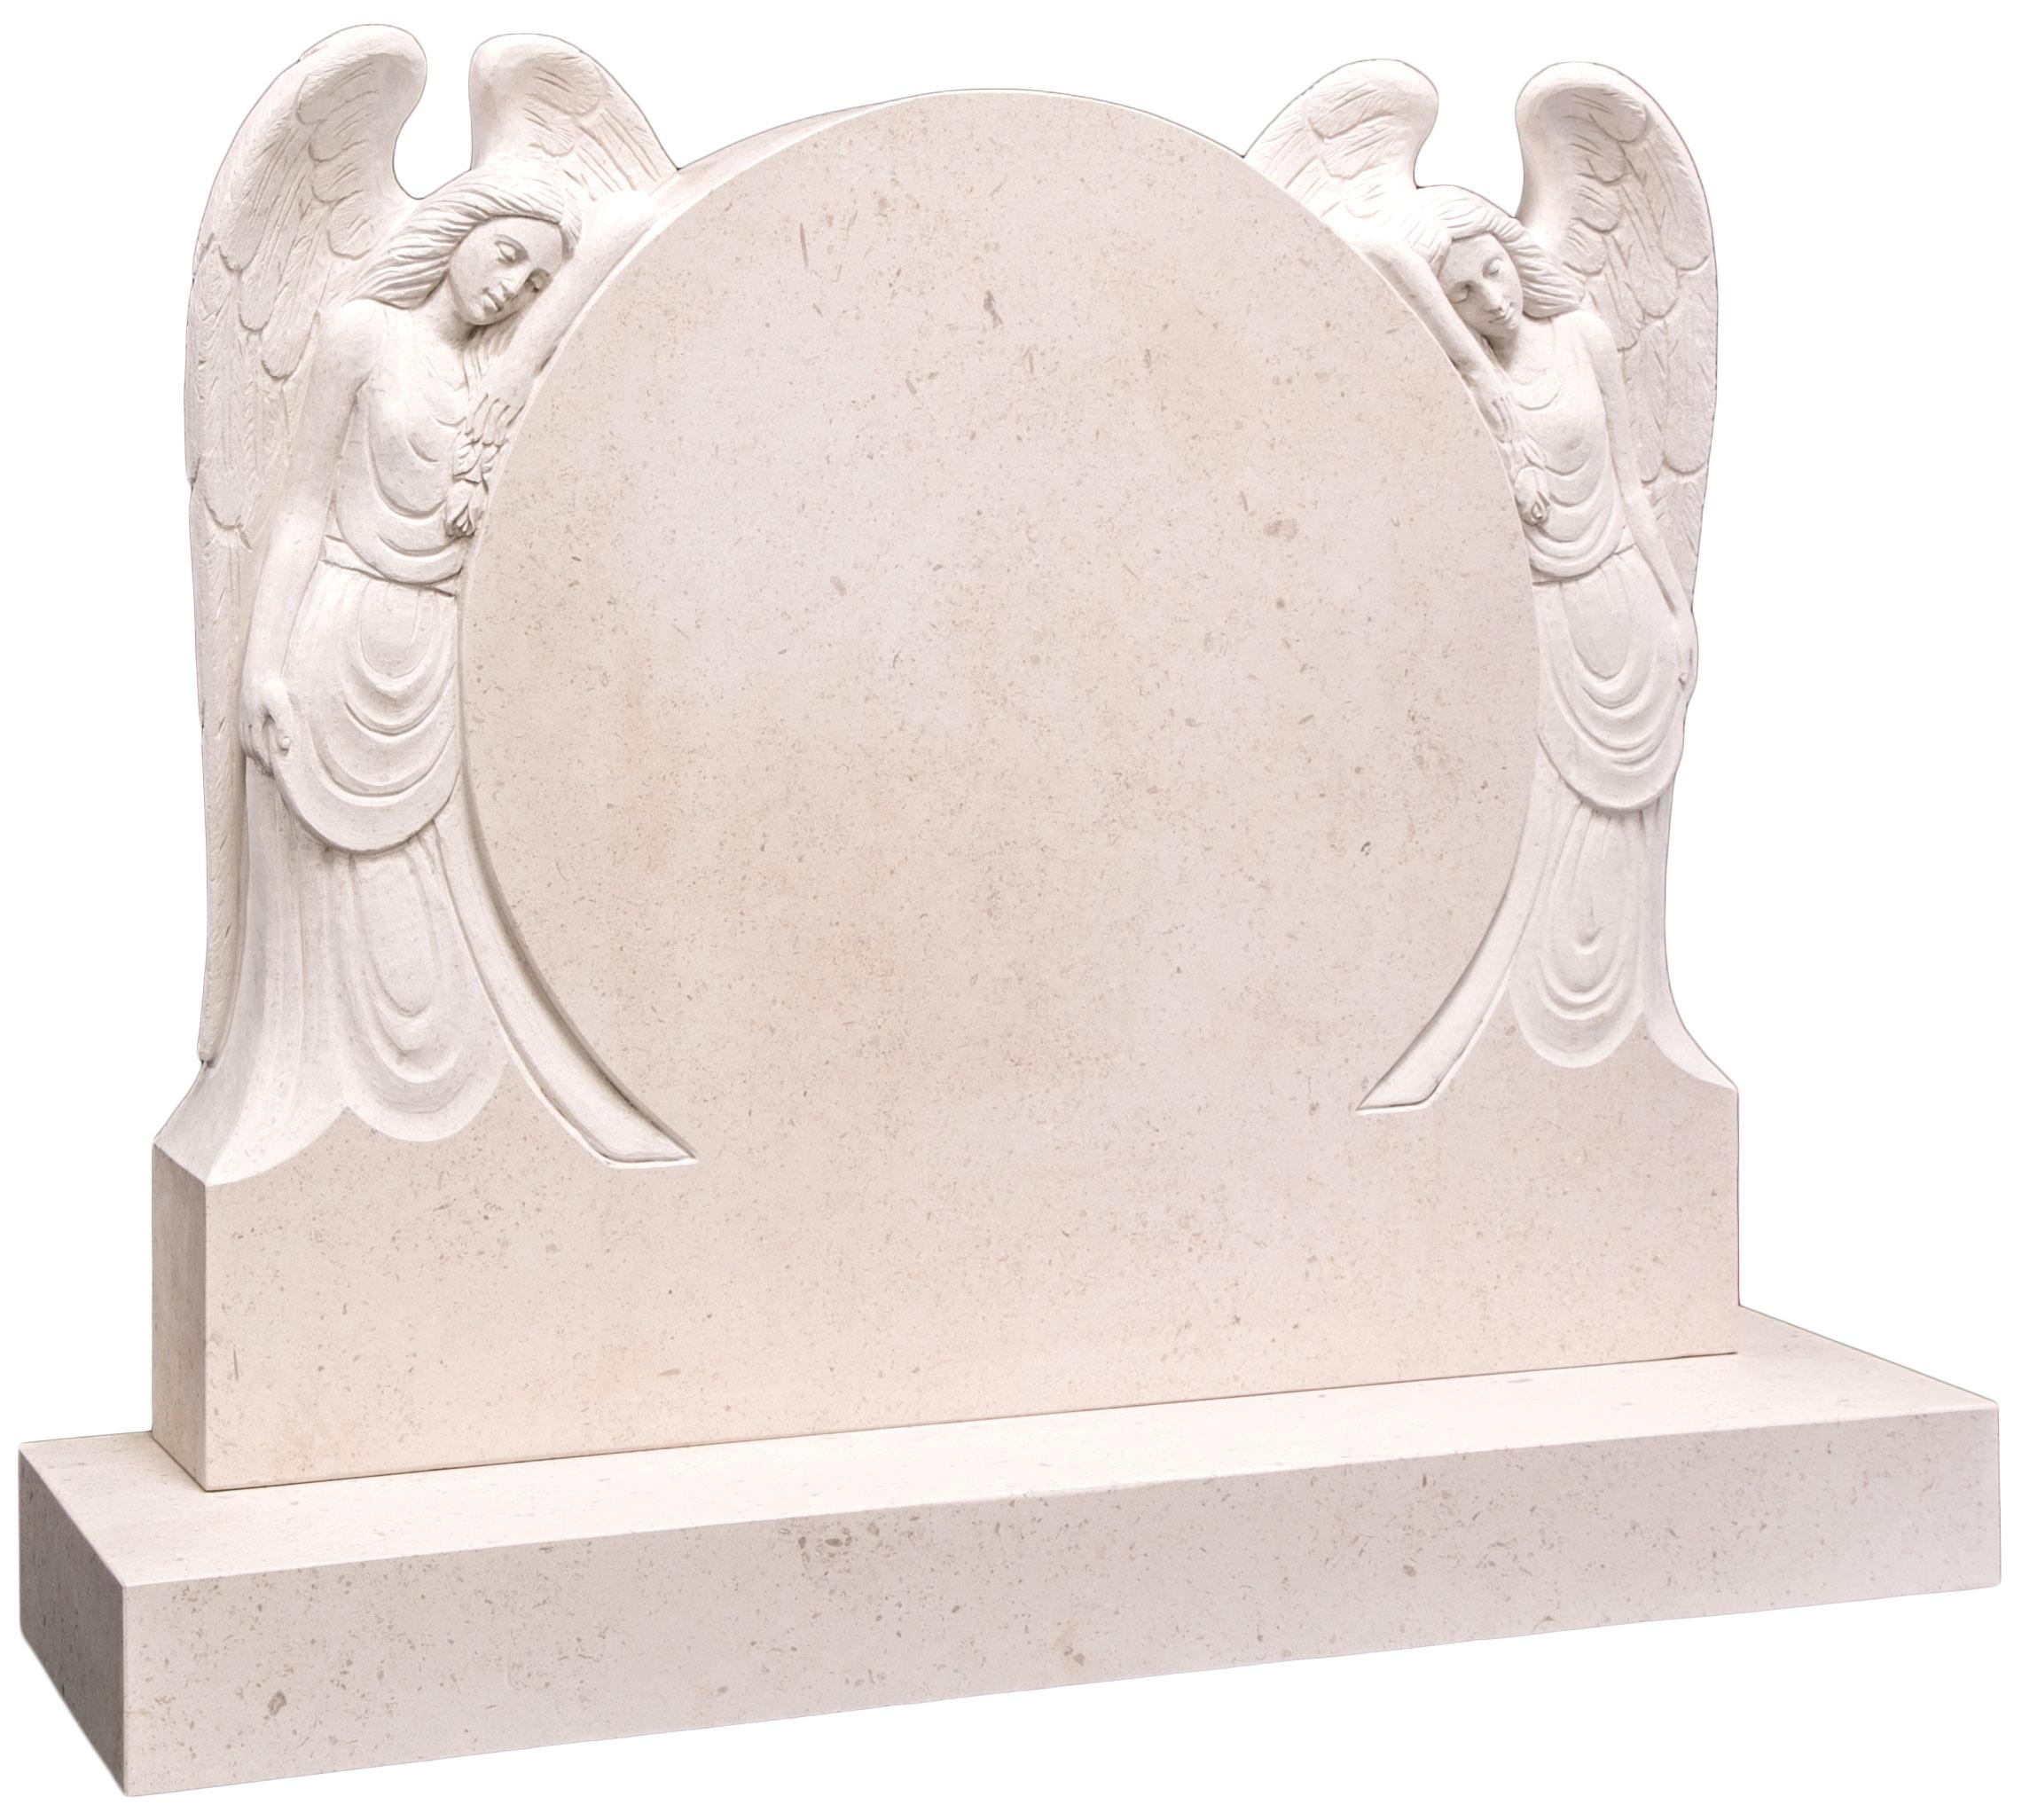 16126 Large impressive headstone